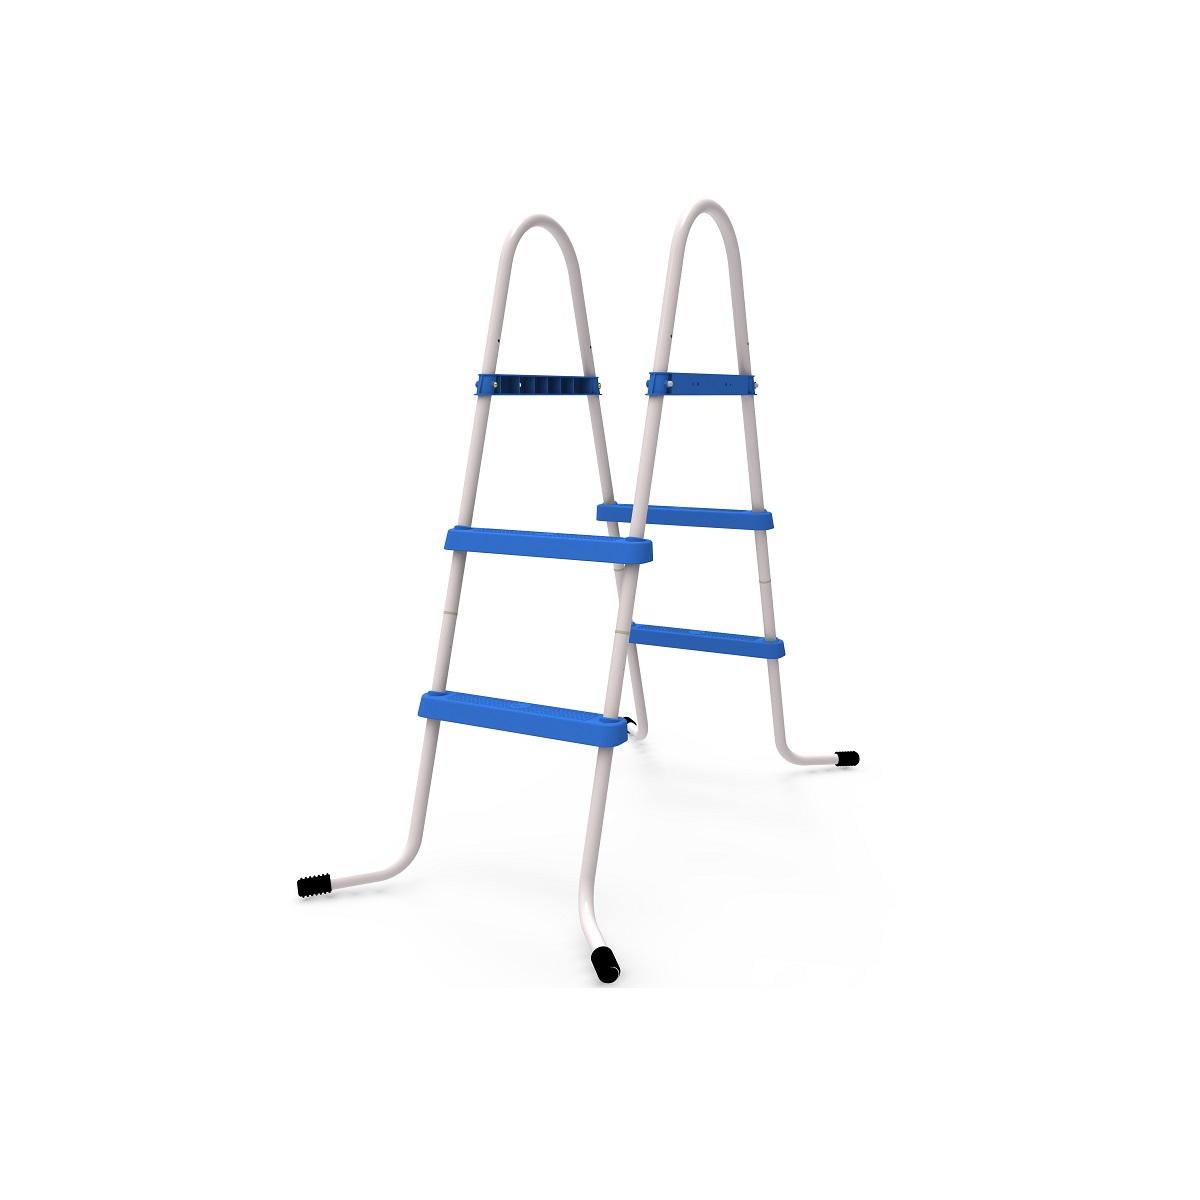 MASTER - schodíky do bazéna s výškou 84 cm